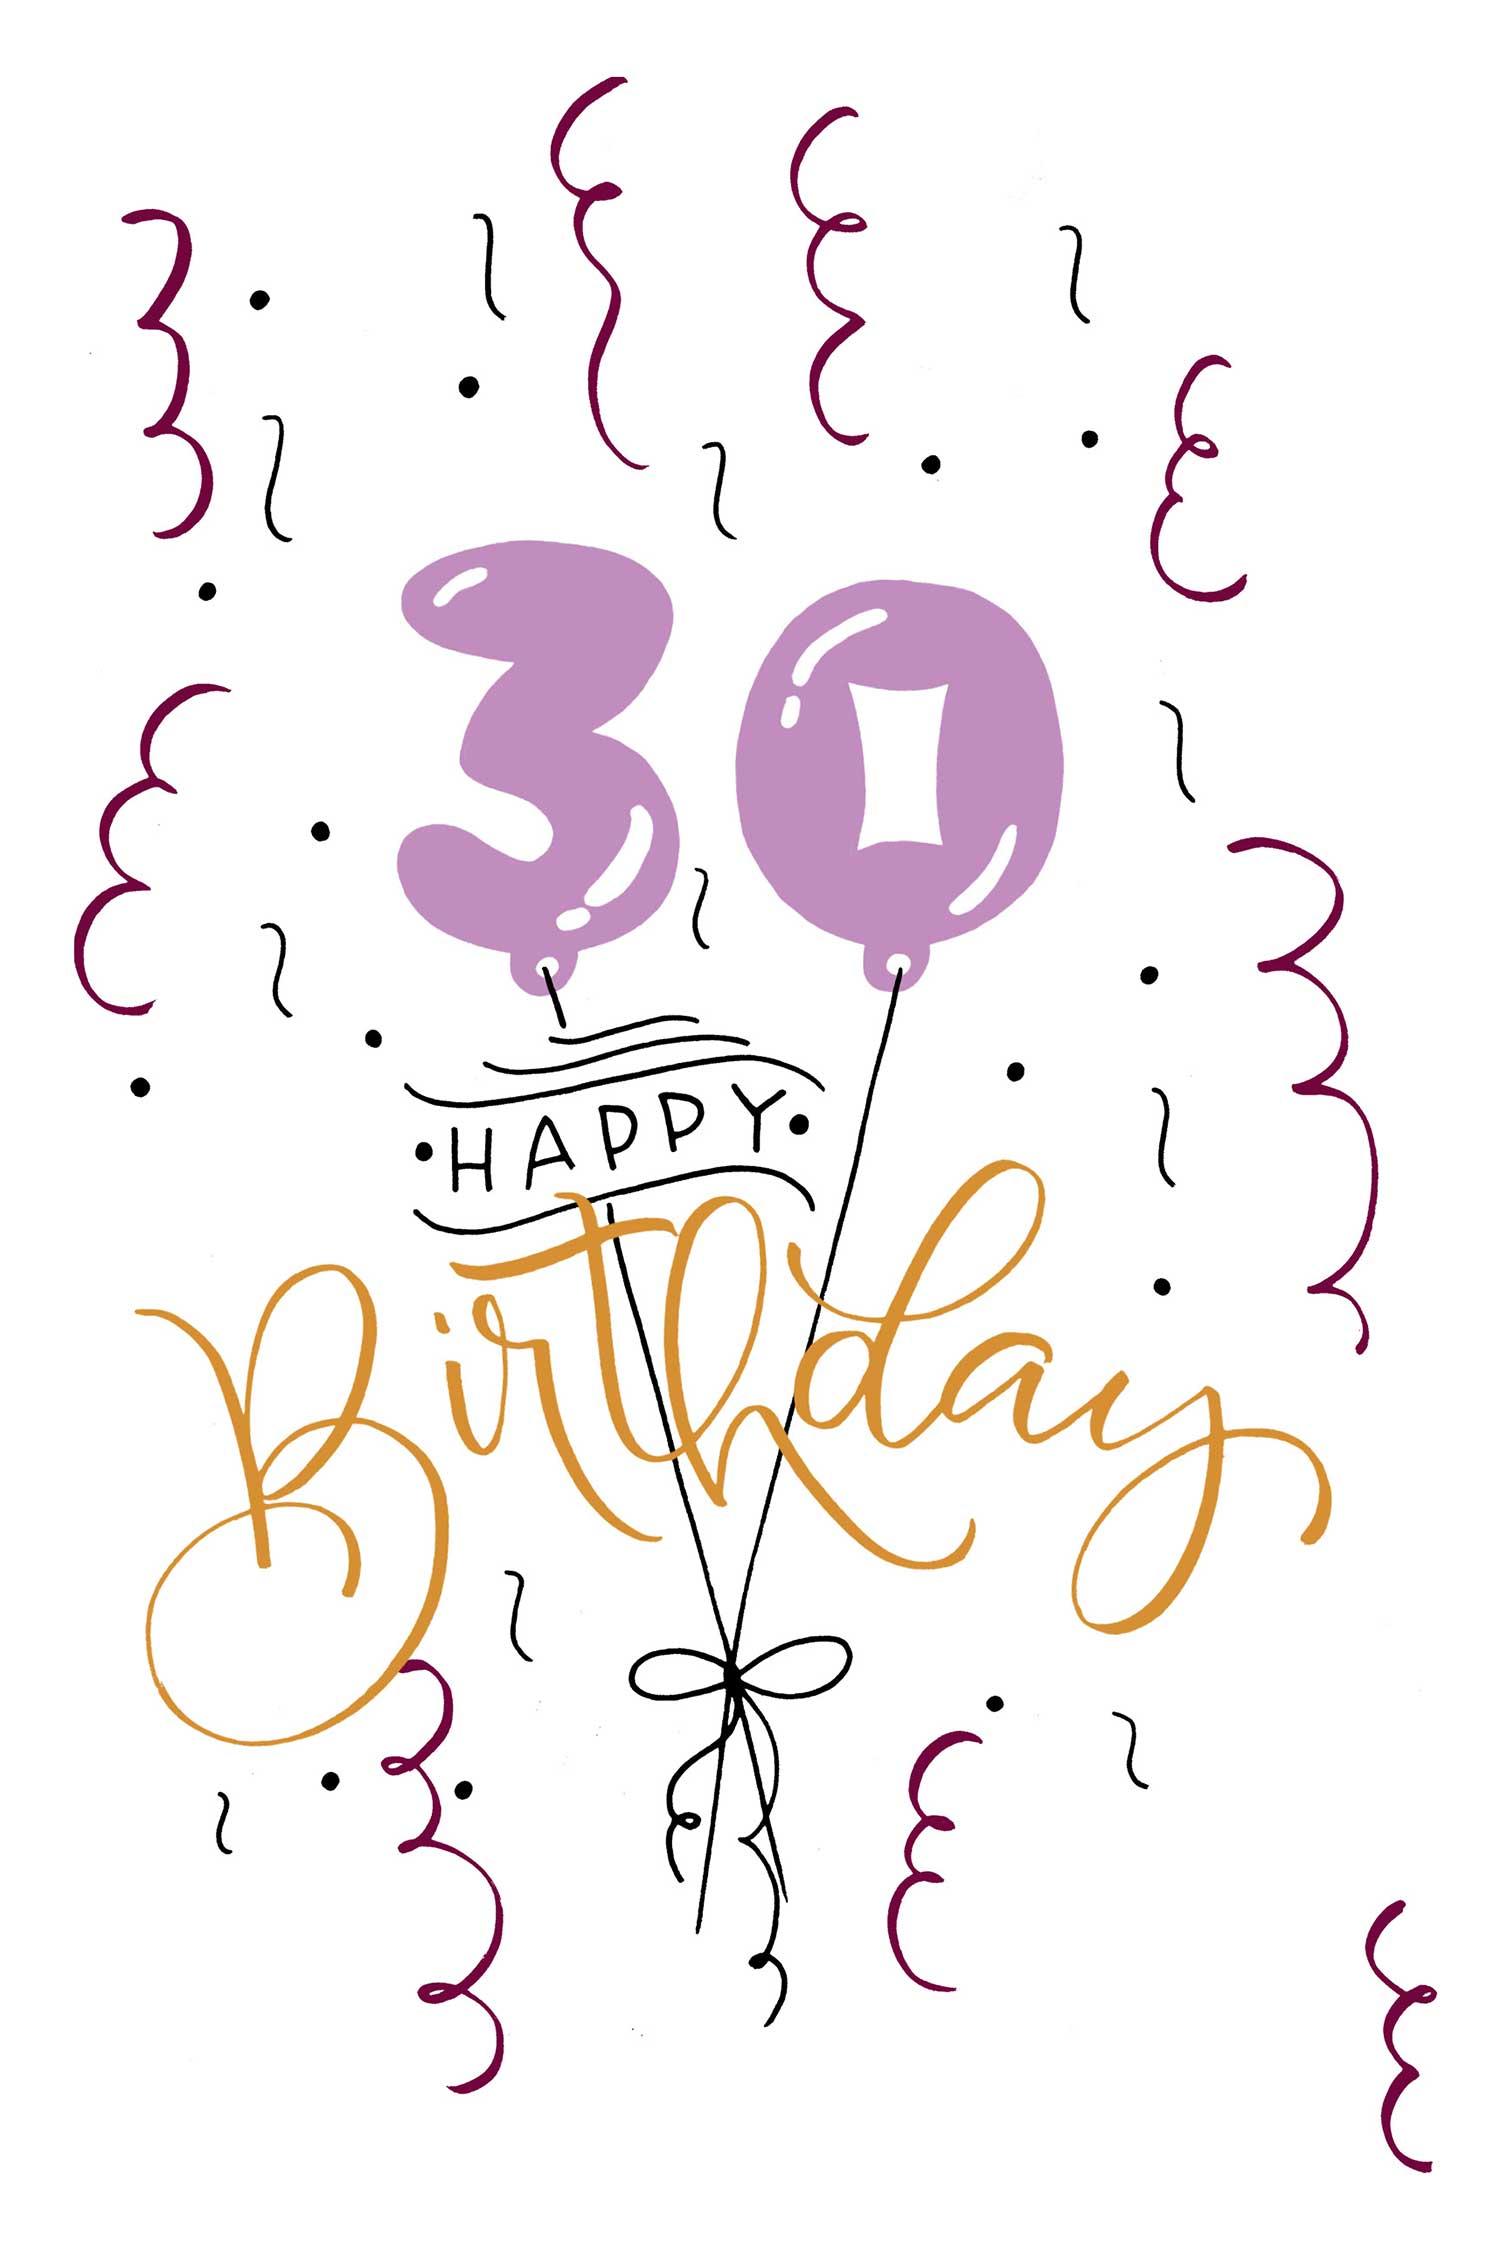 30 Happy Birthday – Bubble-Lettering